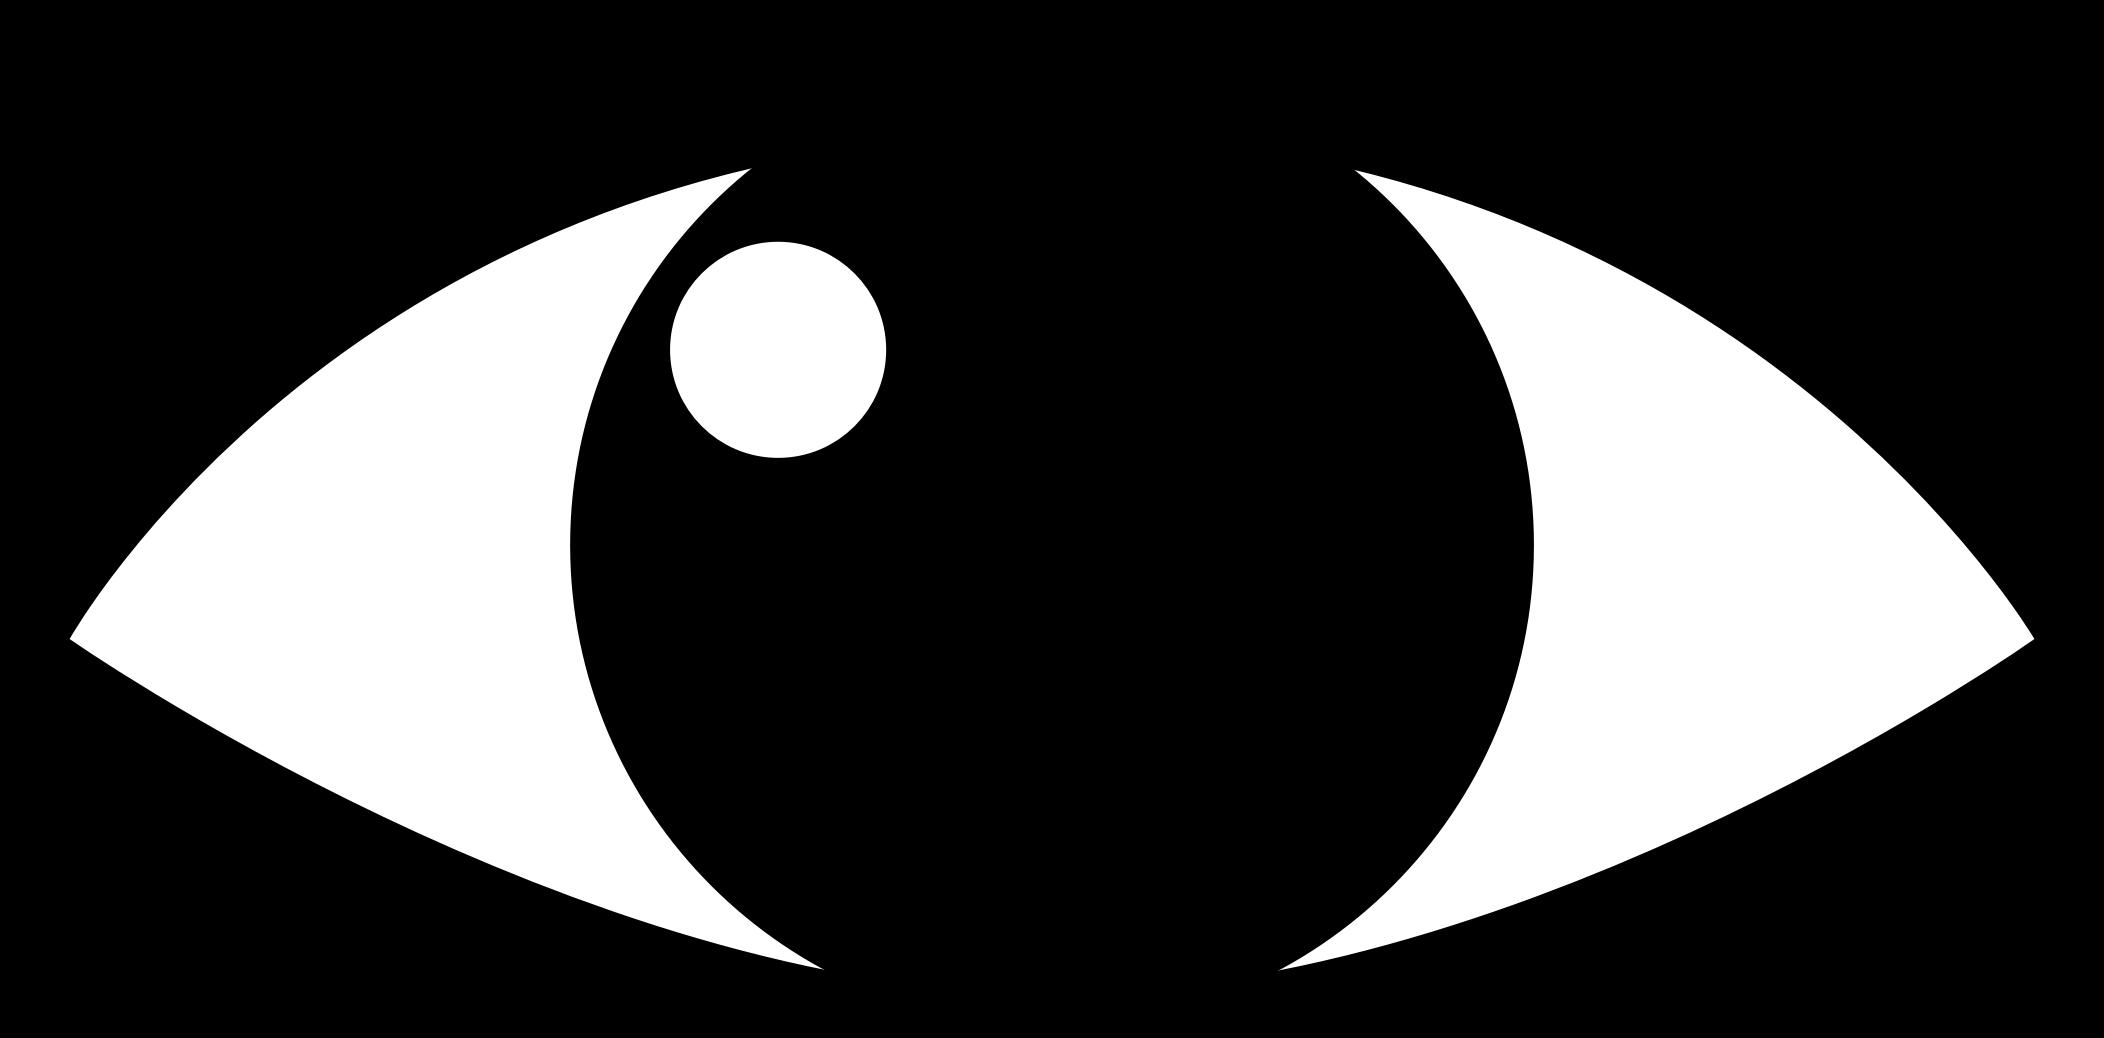 Blue Eyes clipart eyeball White images ClipartBarn art images